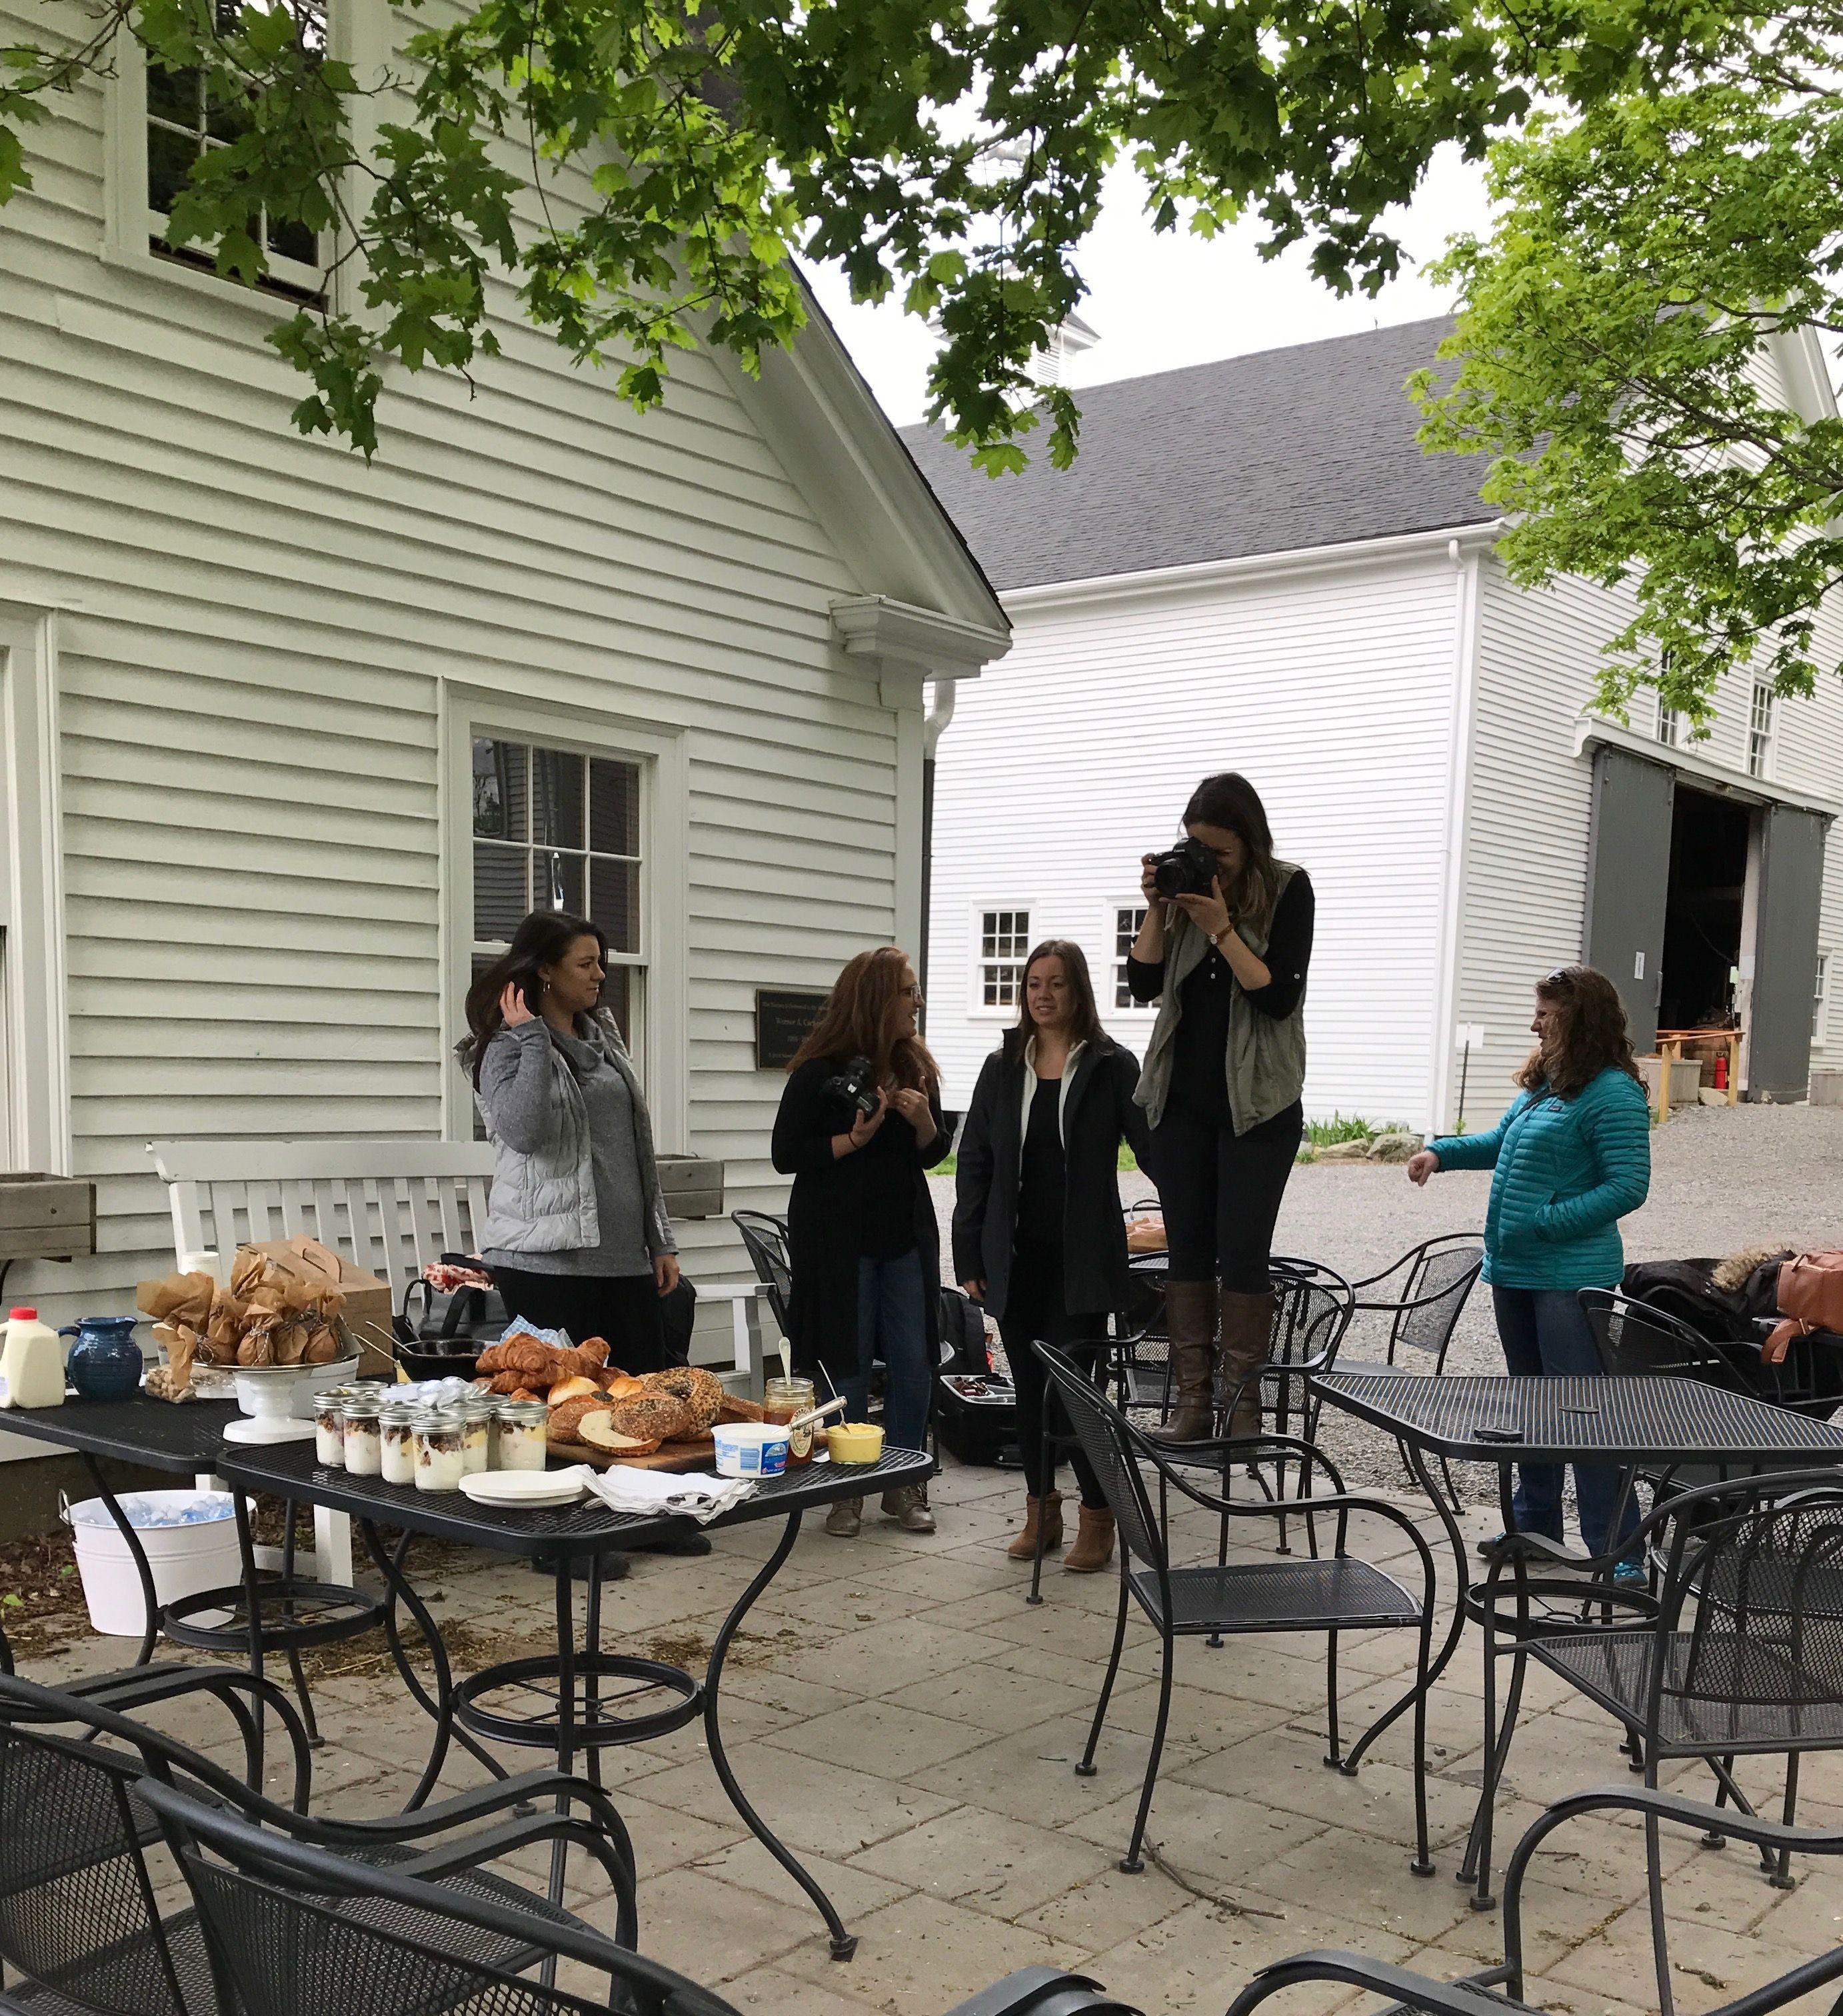 photography workshop with ashley lagrasse wright locke events